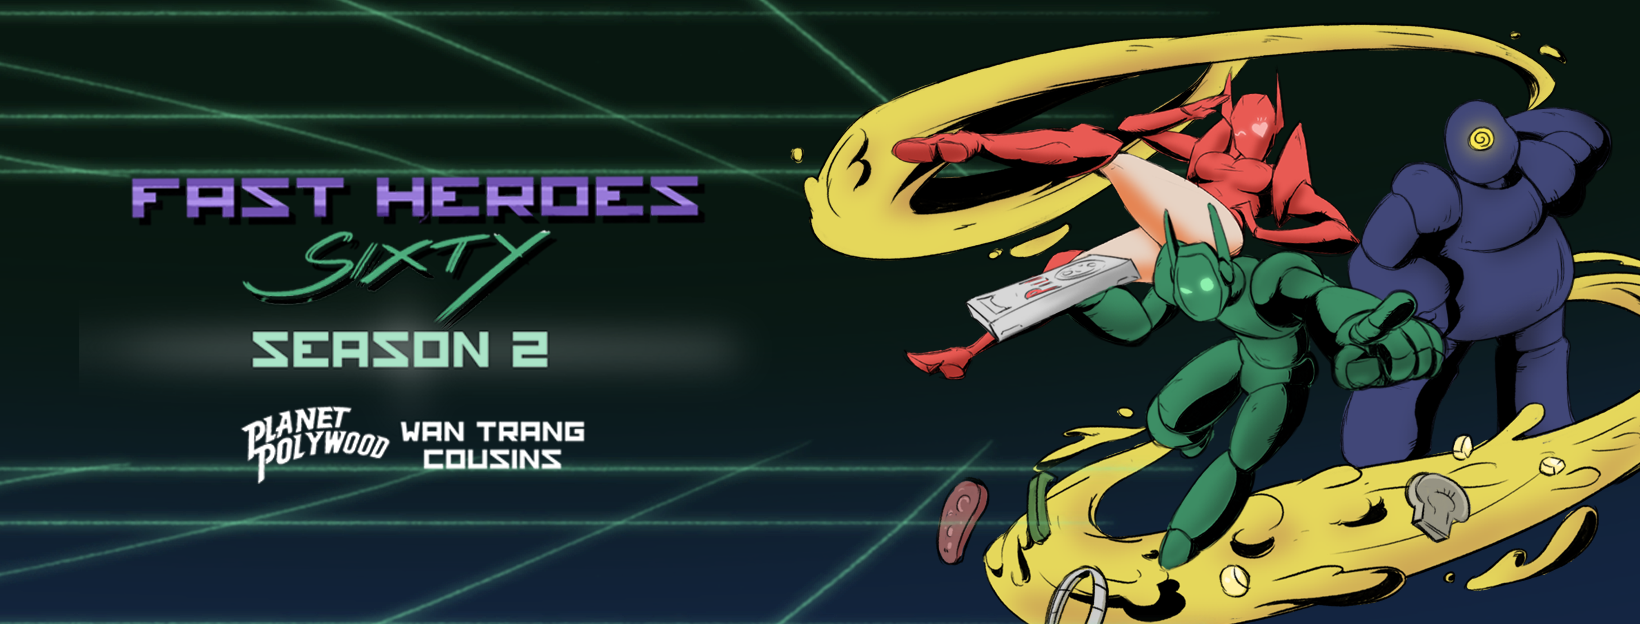 Fast Heroes Sixty – Season 2